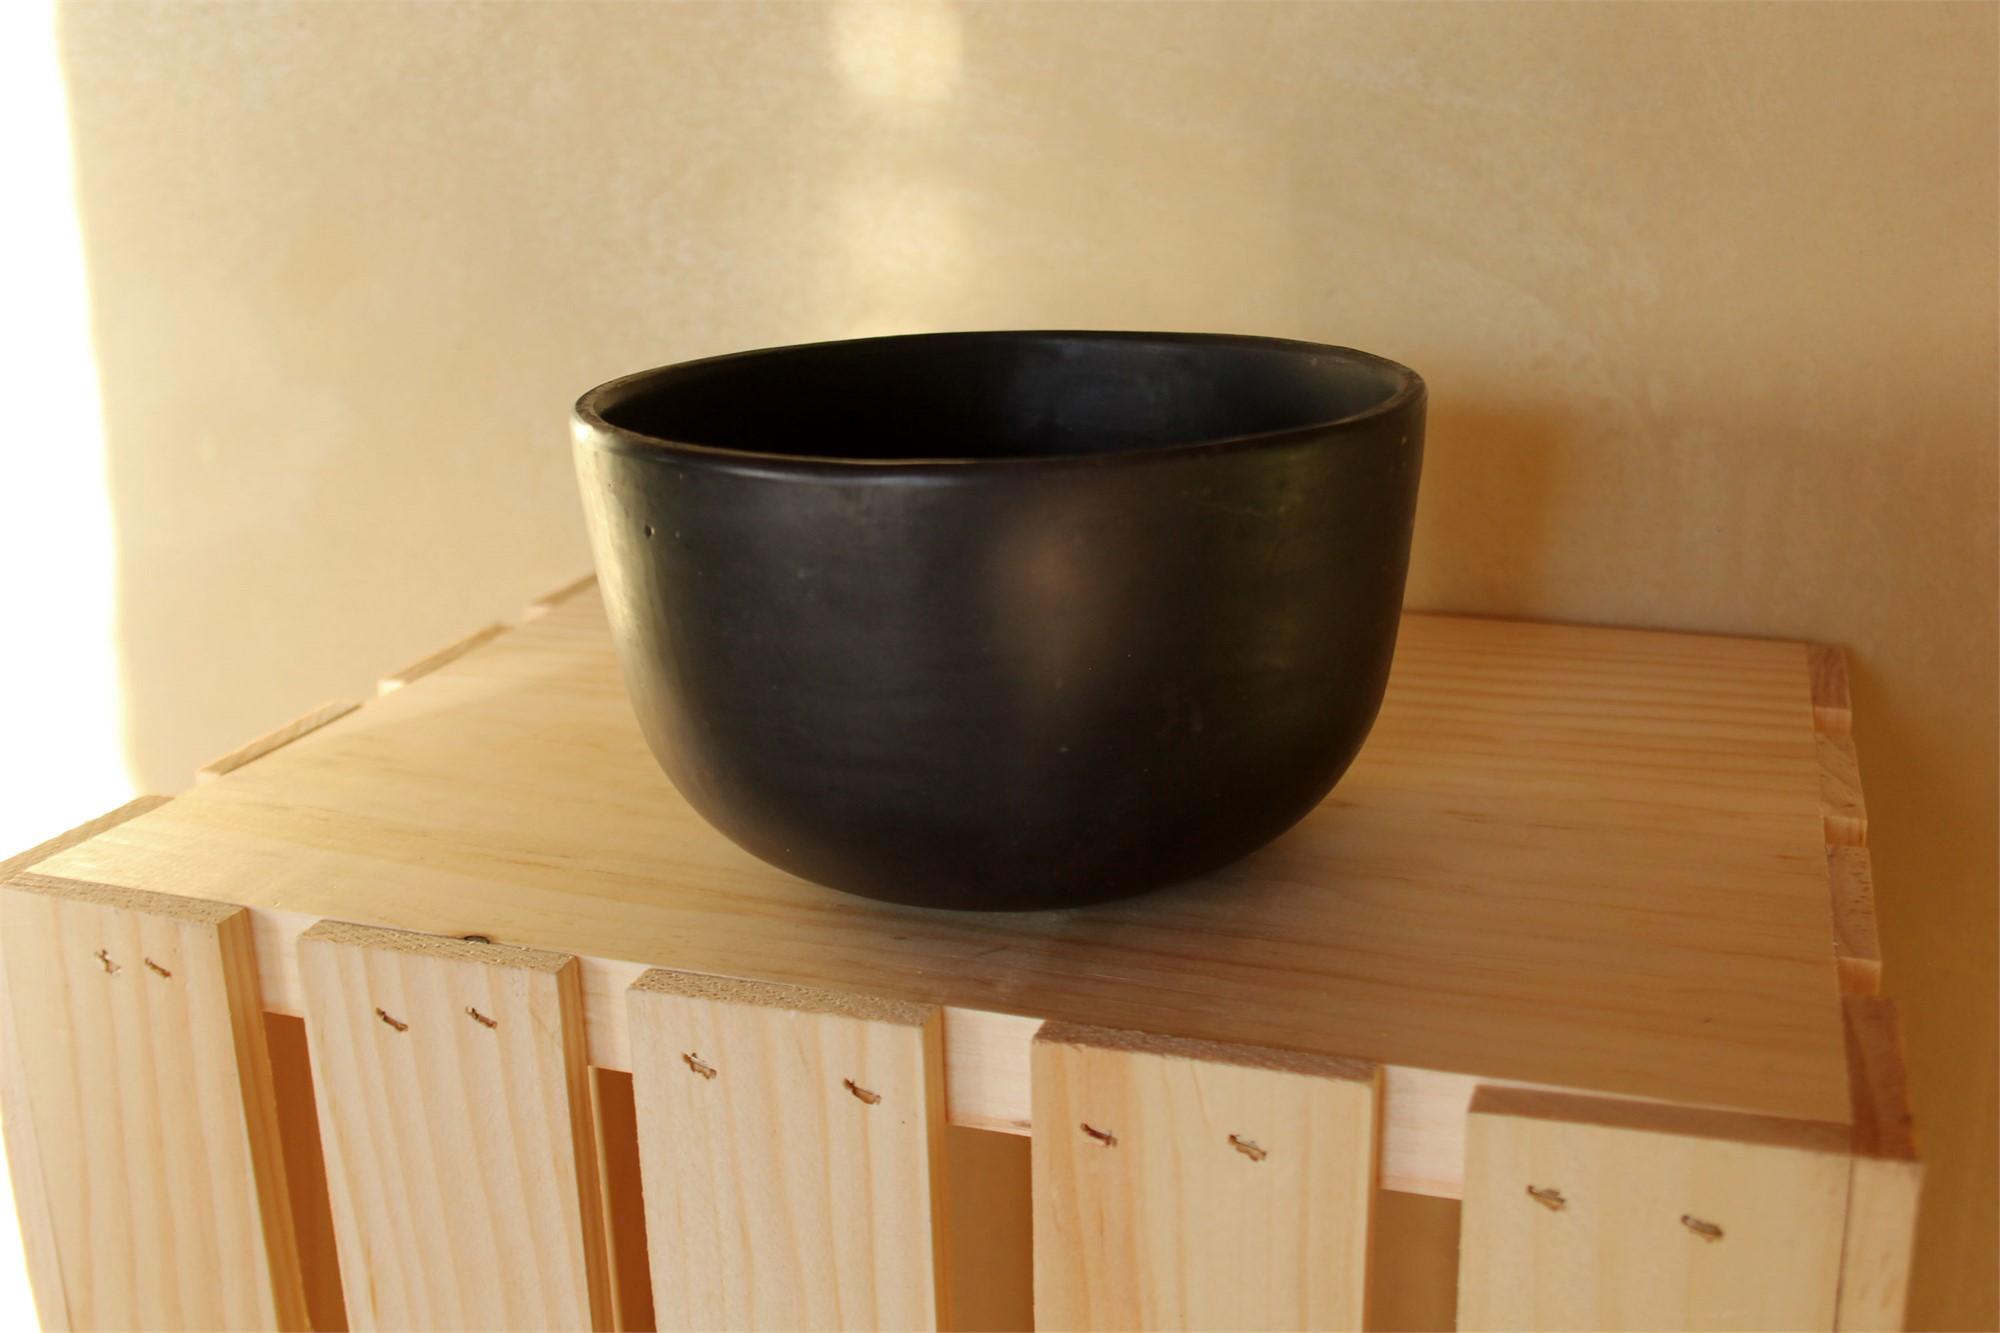 La Negra Soup Bowl by Colectivo 1050